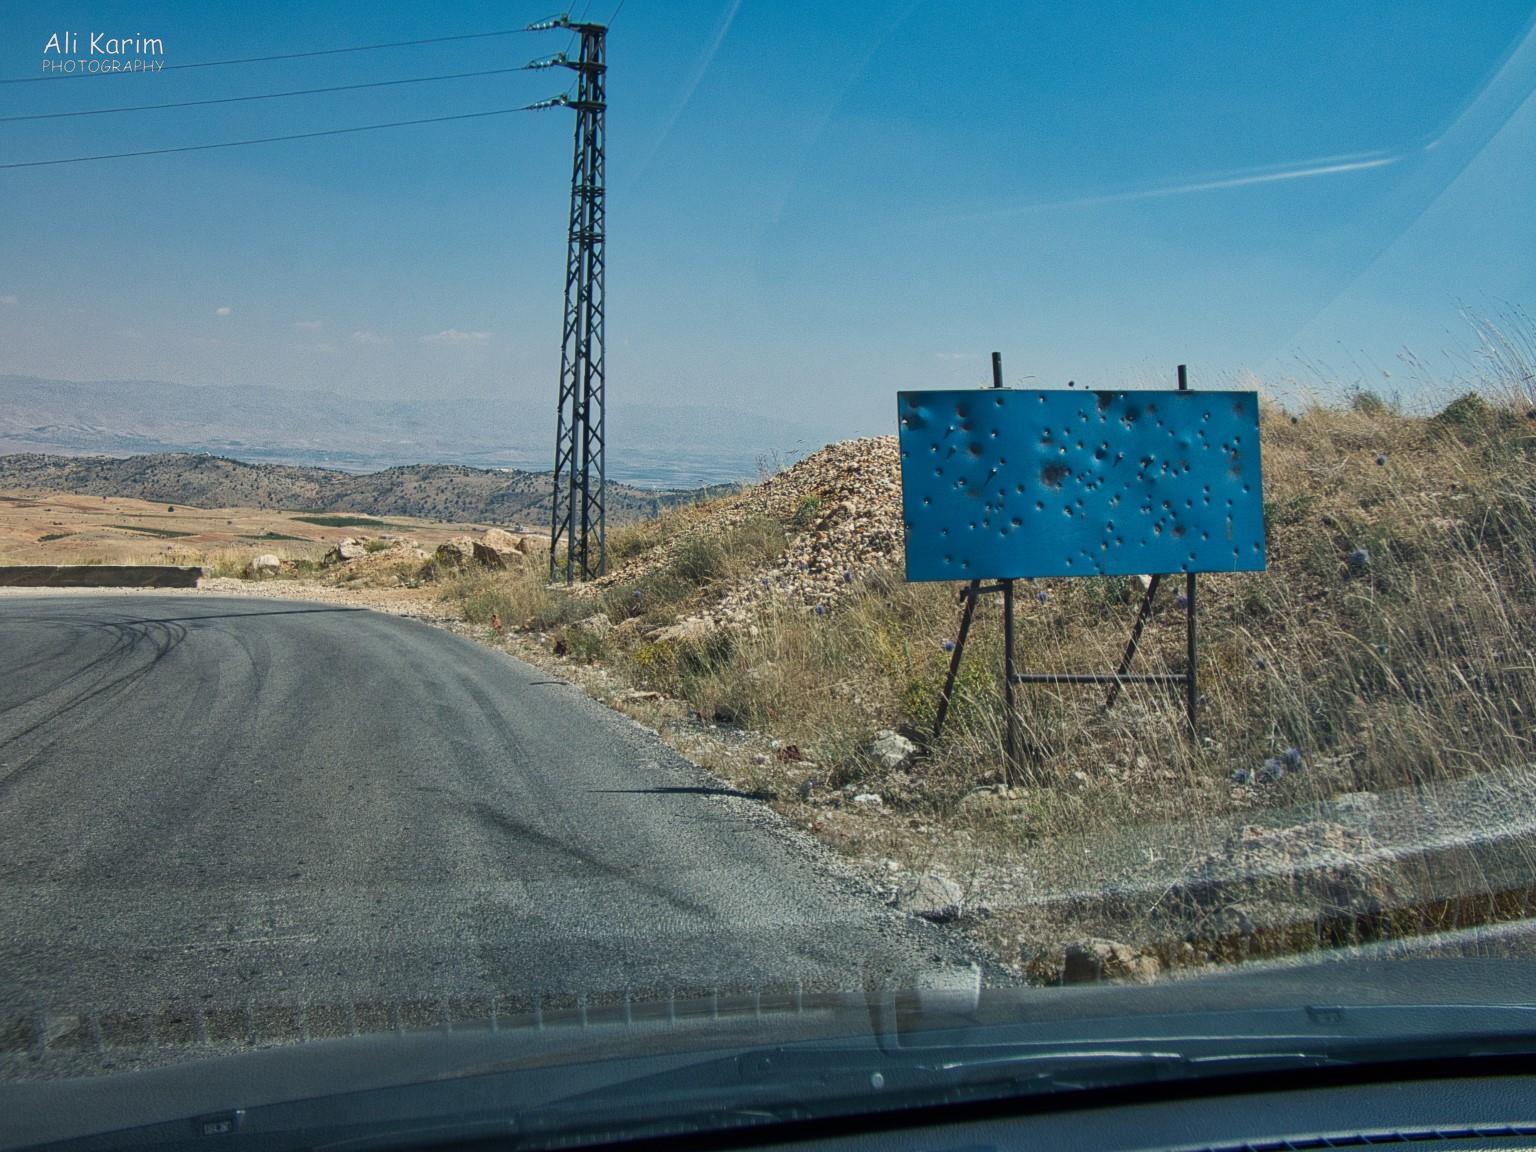 Bsharri and Quadisha Valley Interesting roadside sign